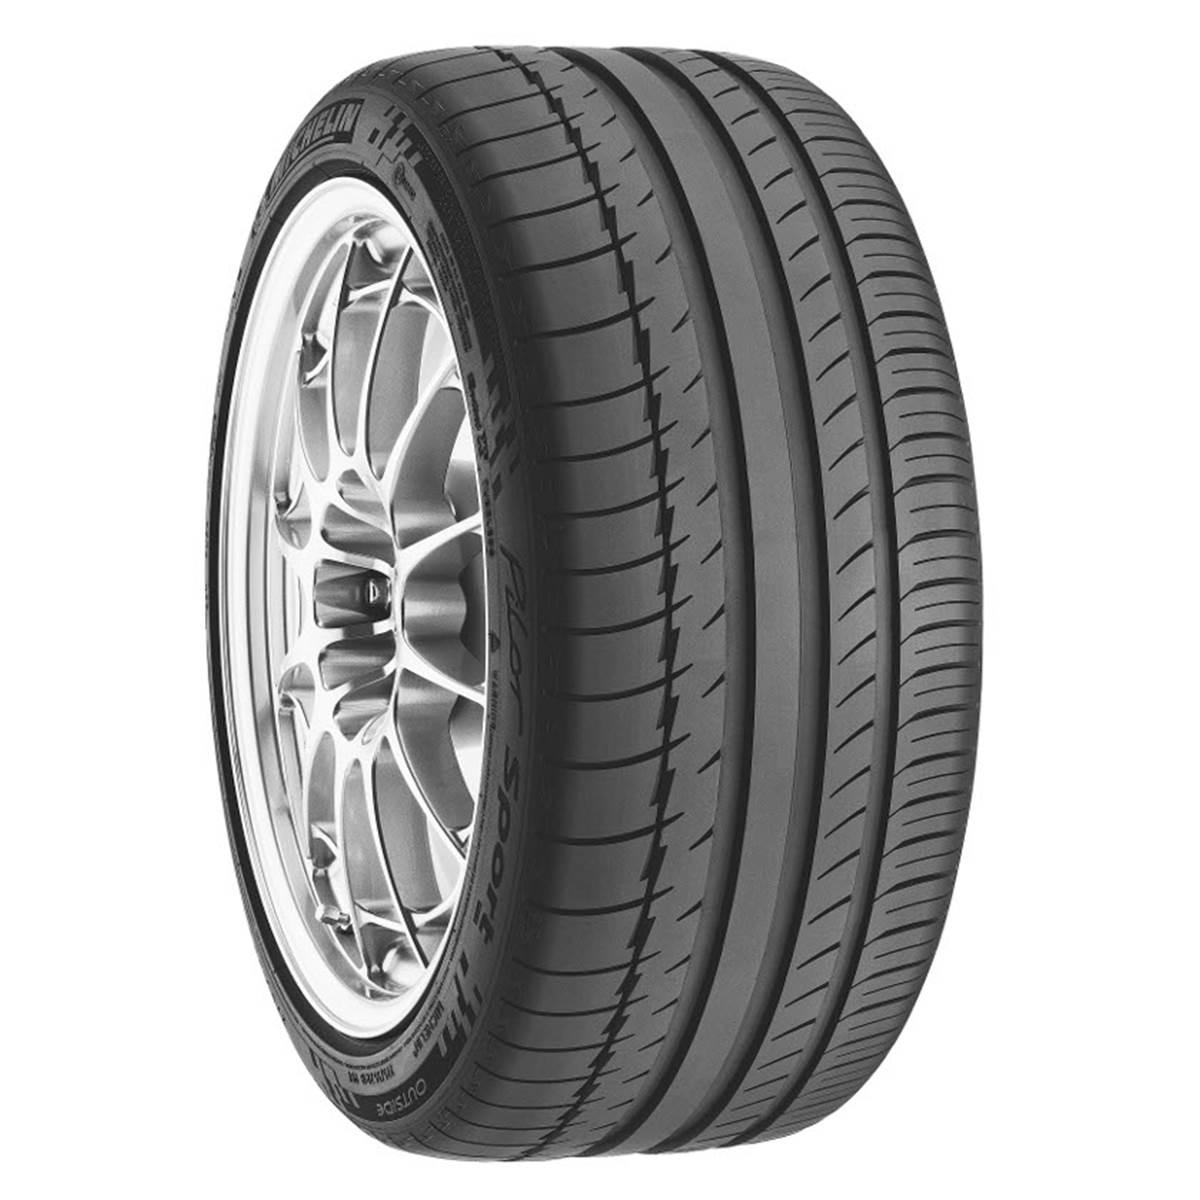 Pneu Michelin 245/35R21 96Y Pilot Sport Ps2 XL